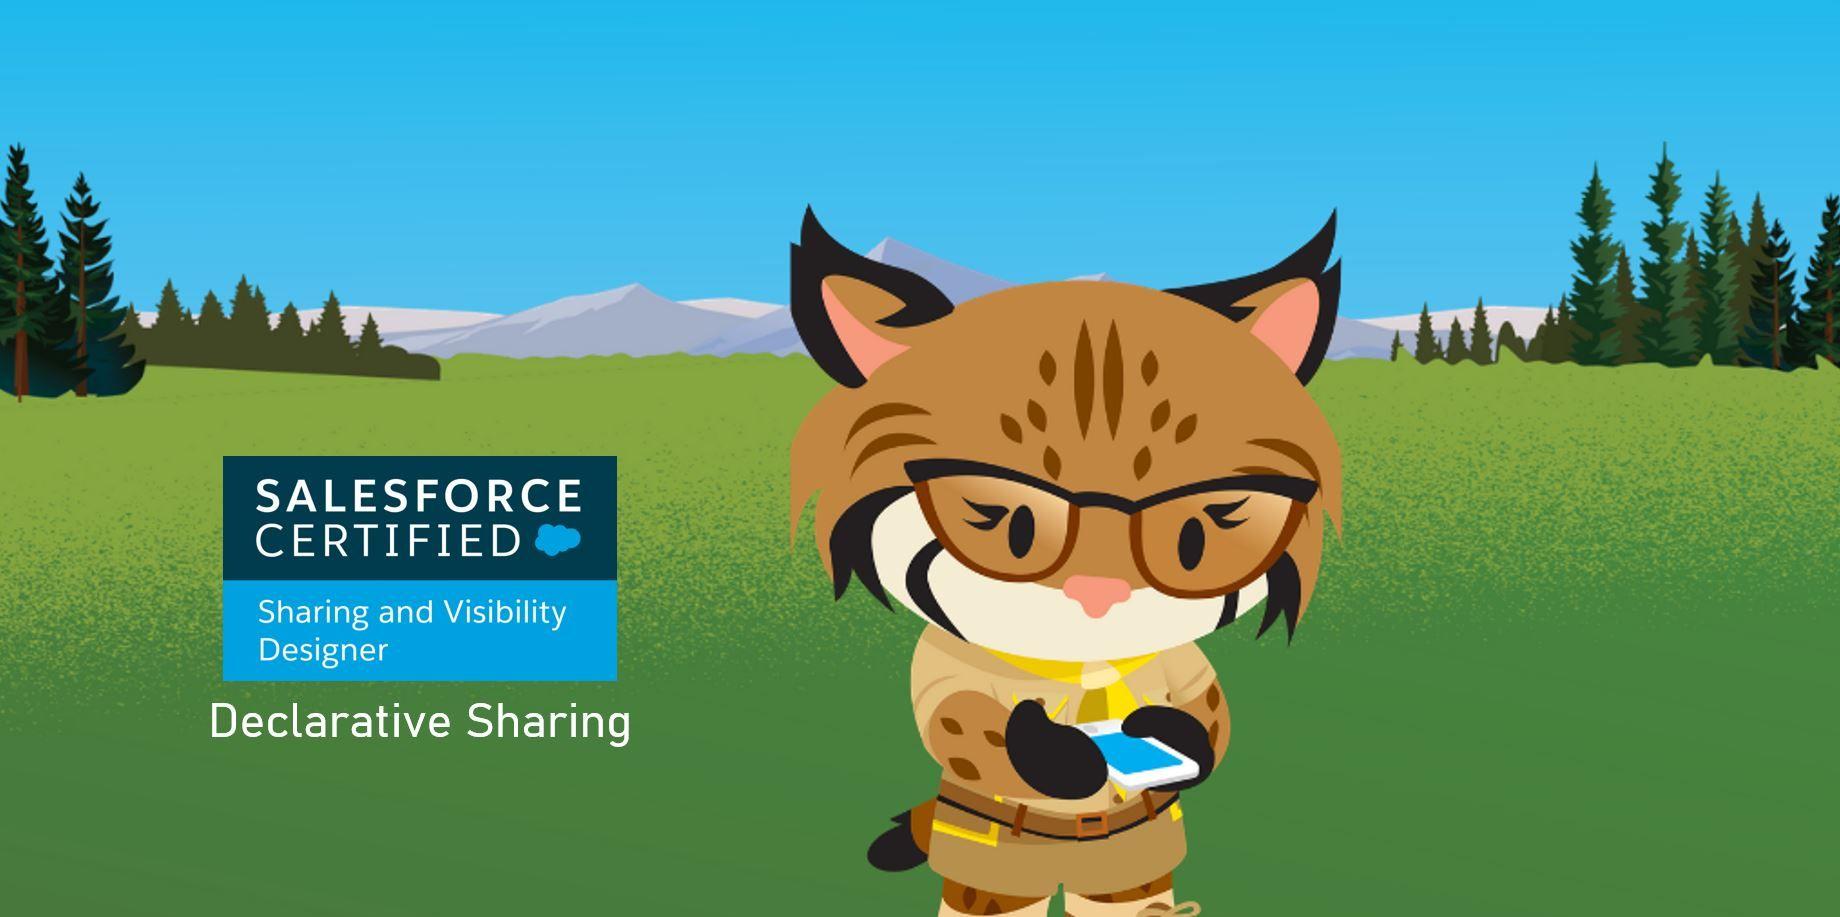 Salesforce Sharing and Visibility Designer Exam Preparation: Declarative Sharing